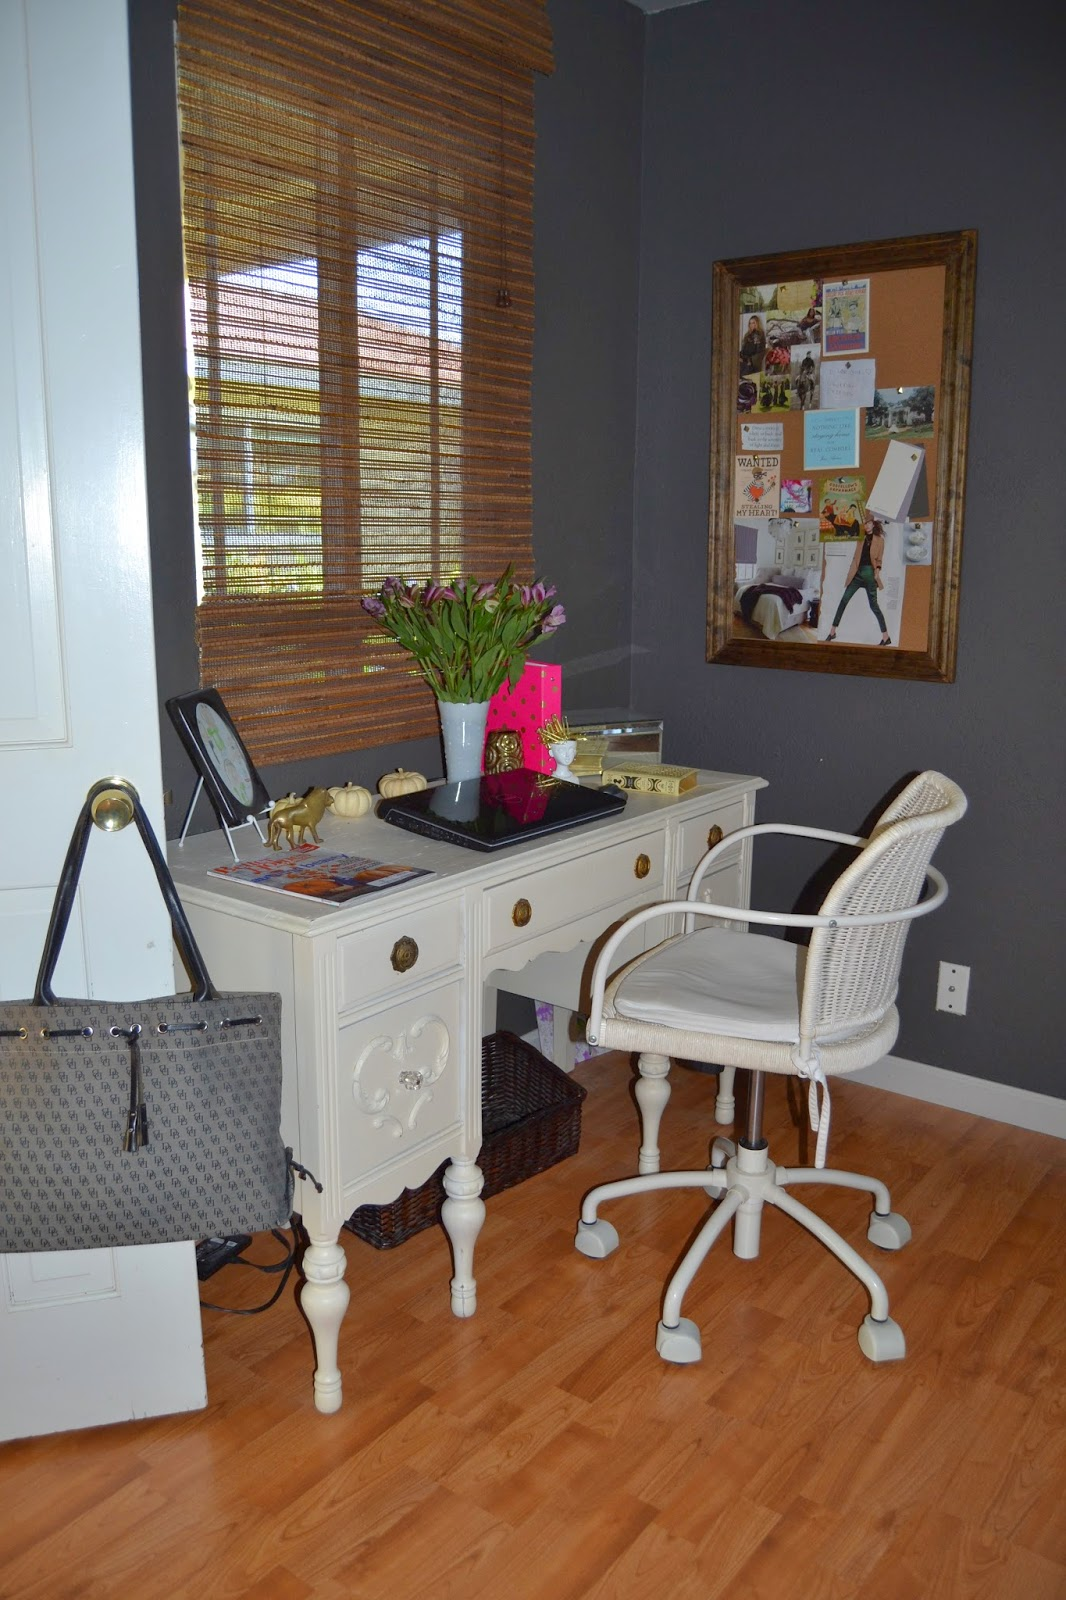 Desert girls vintage office space inspiration board for Office space inspiration